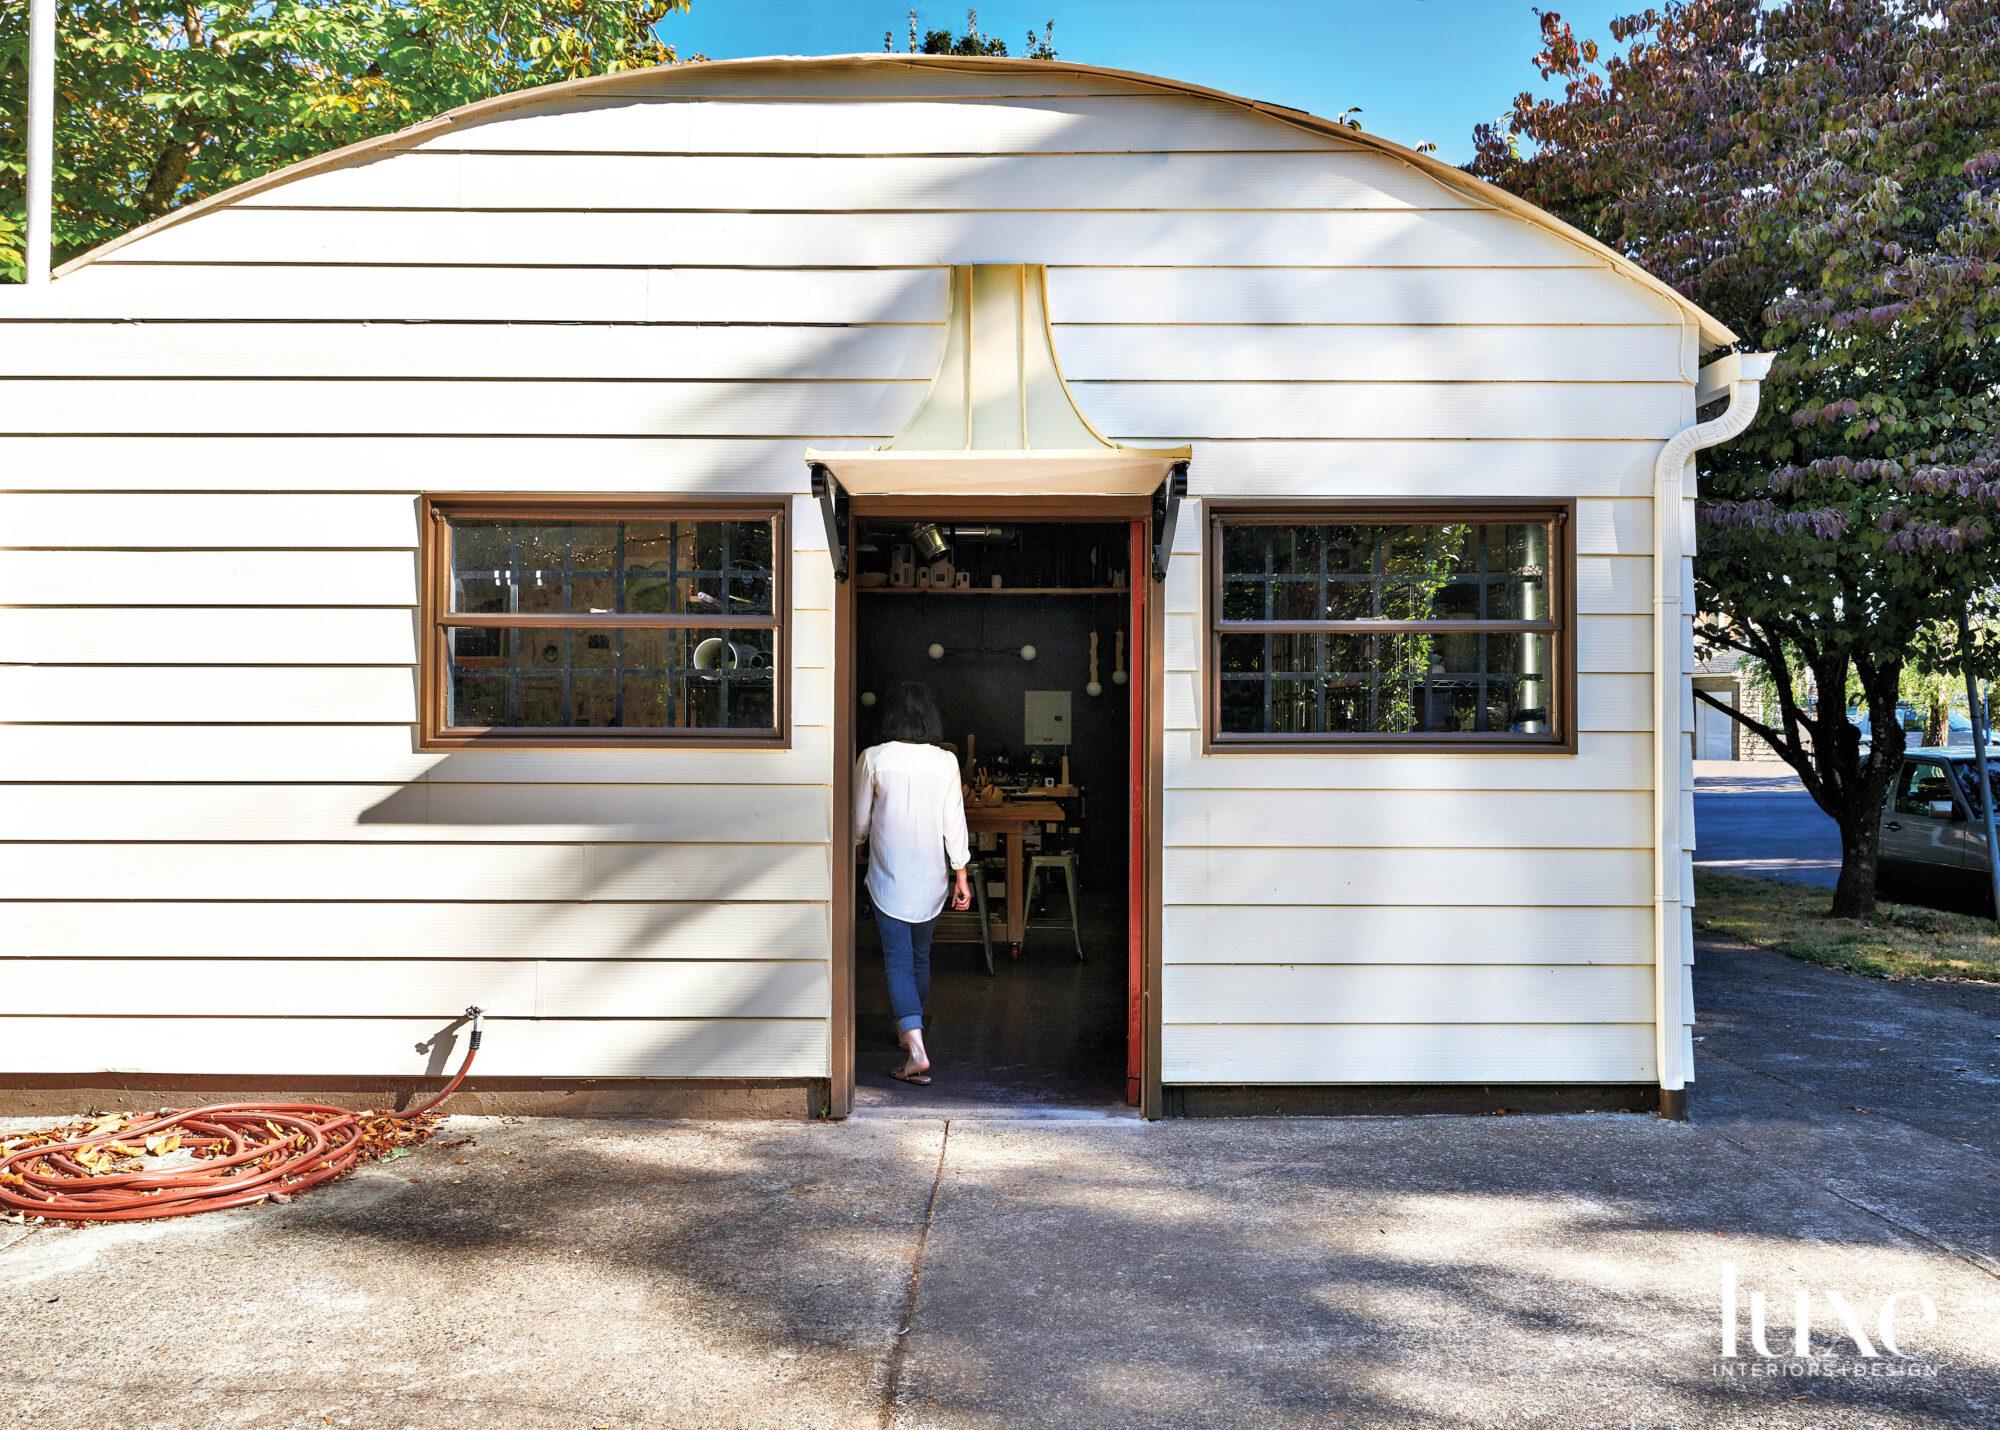 Jenny Poston walks into her Quonset hut studio in Southeast Portland